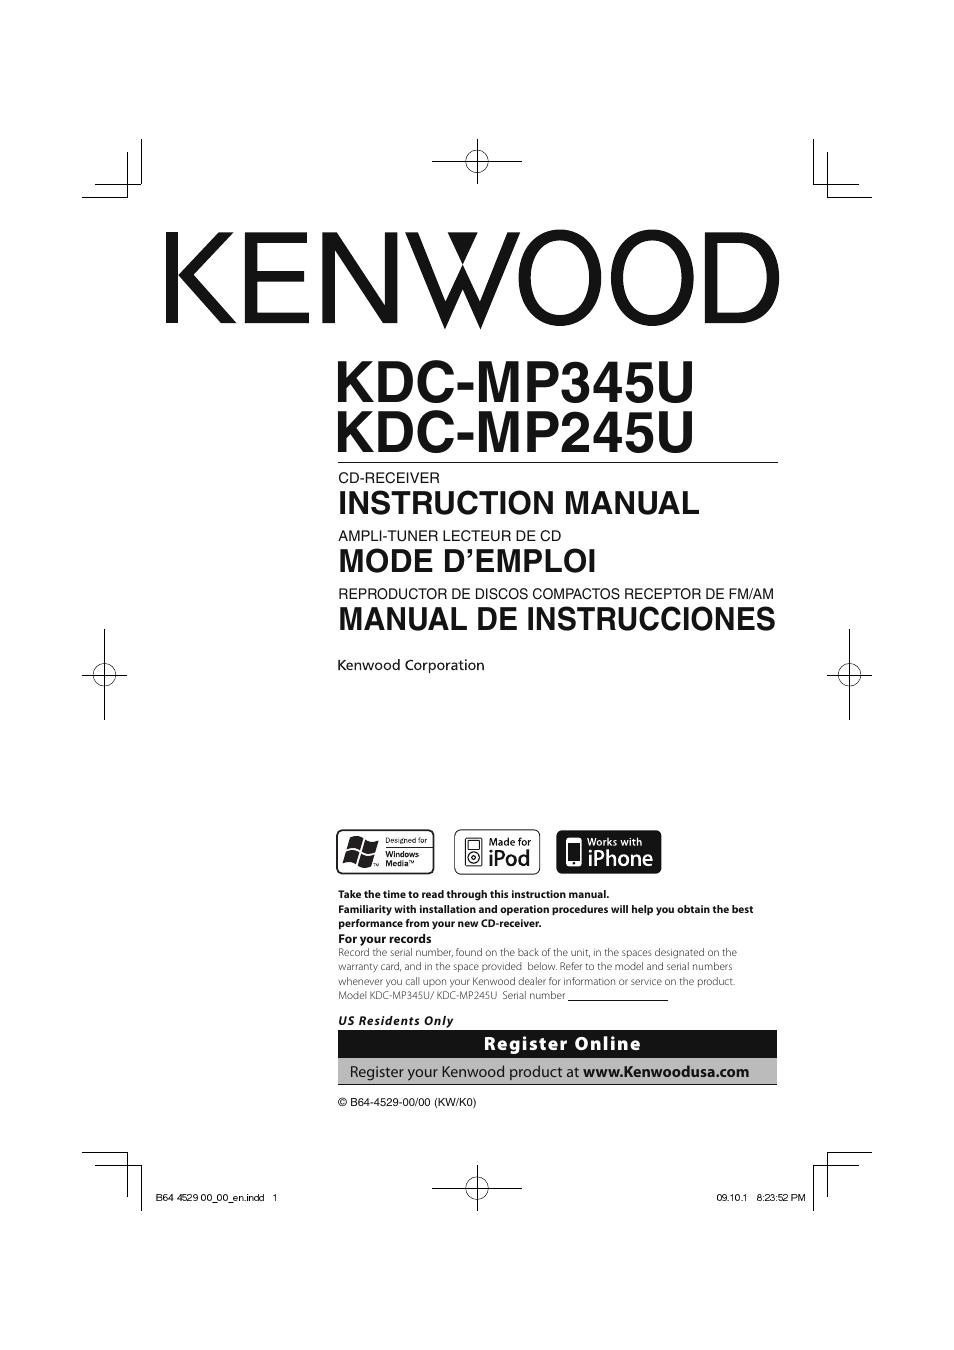 kenwood model kdc wiring diagram directv swm 32 kdc-mp345u user manual   68 pages also for: kdc-mp245u